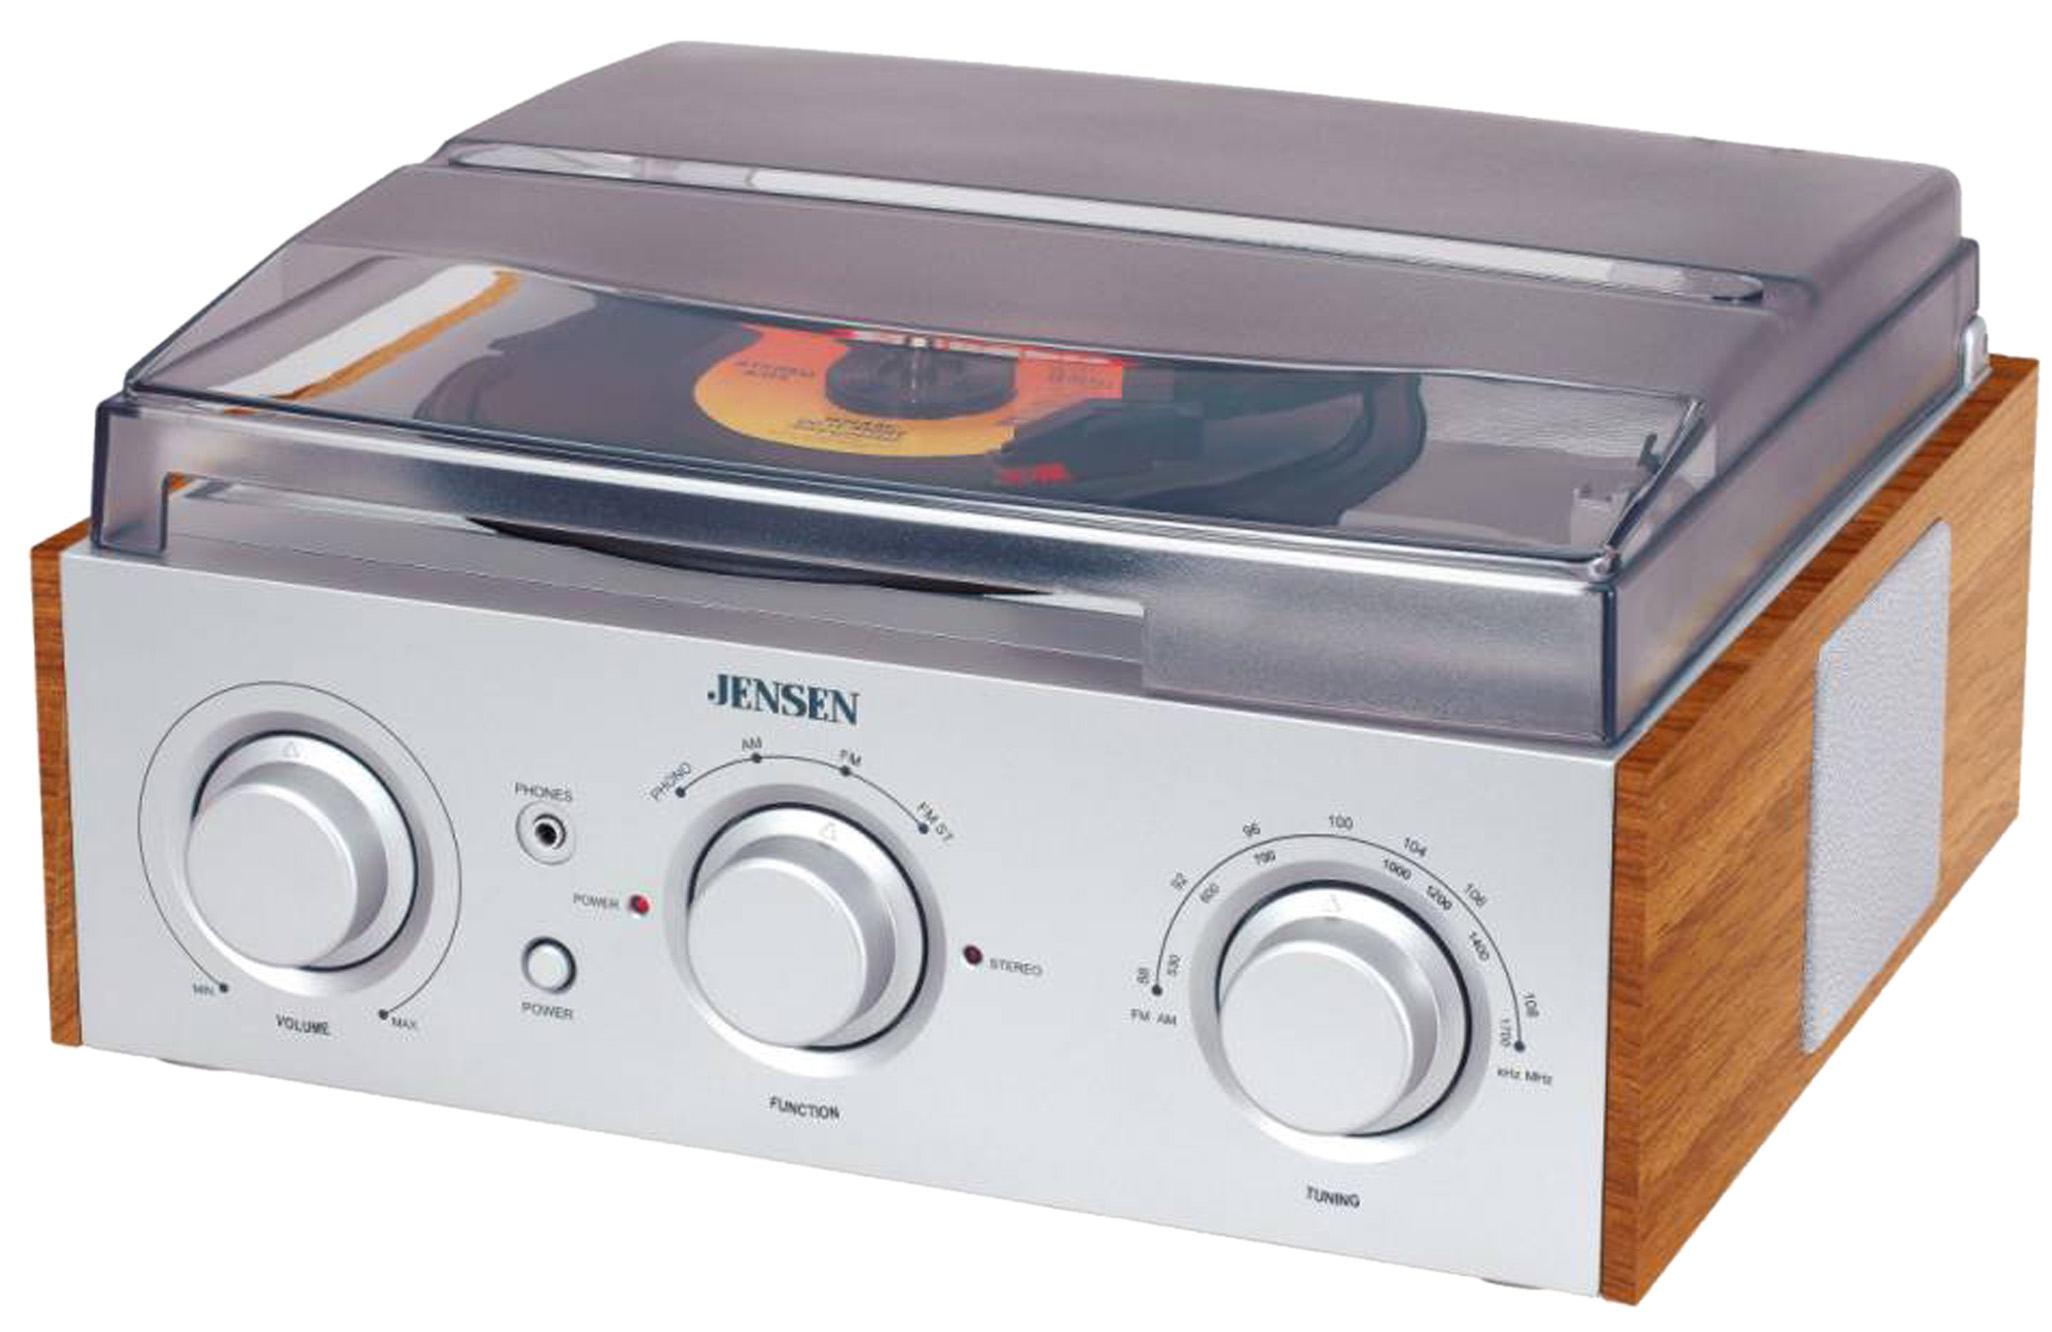 JENSEN JTA220 SILVER TURNTABLE 3 SPEED WITH AM FM RECEIVER